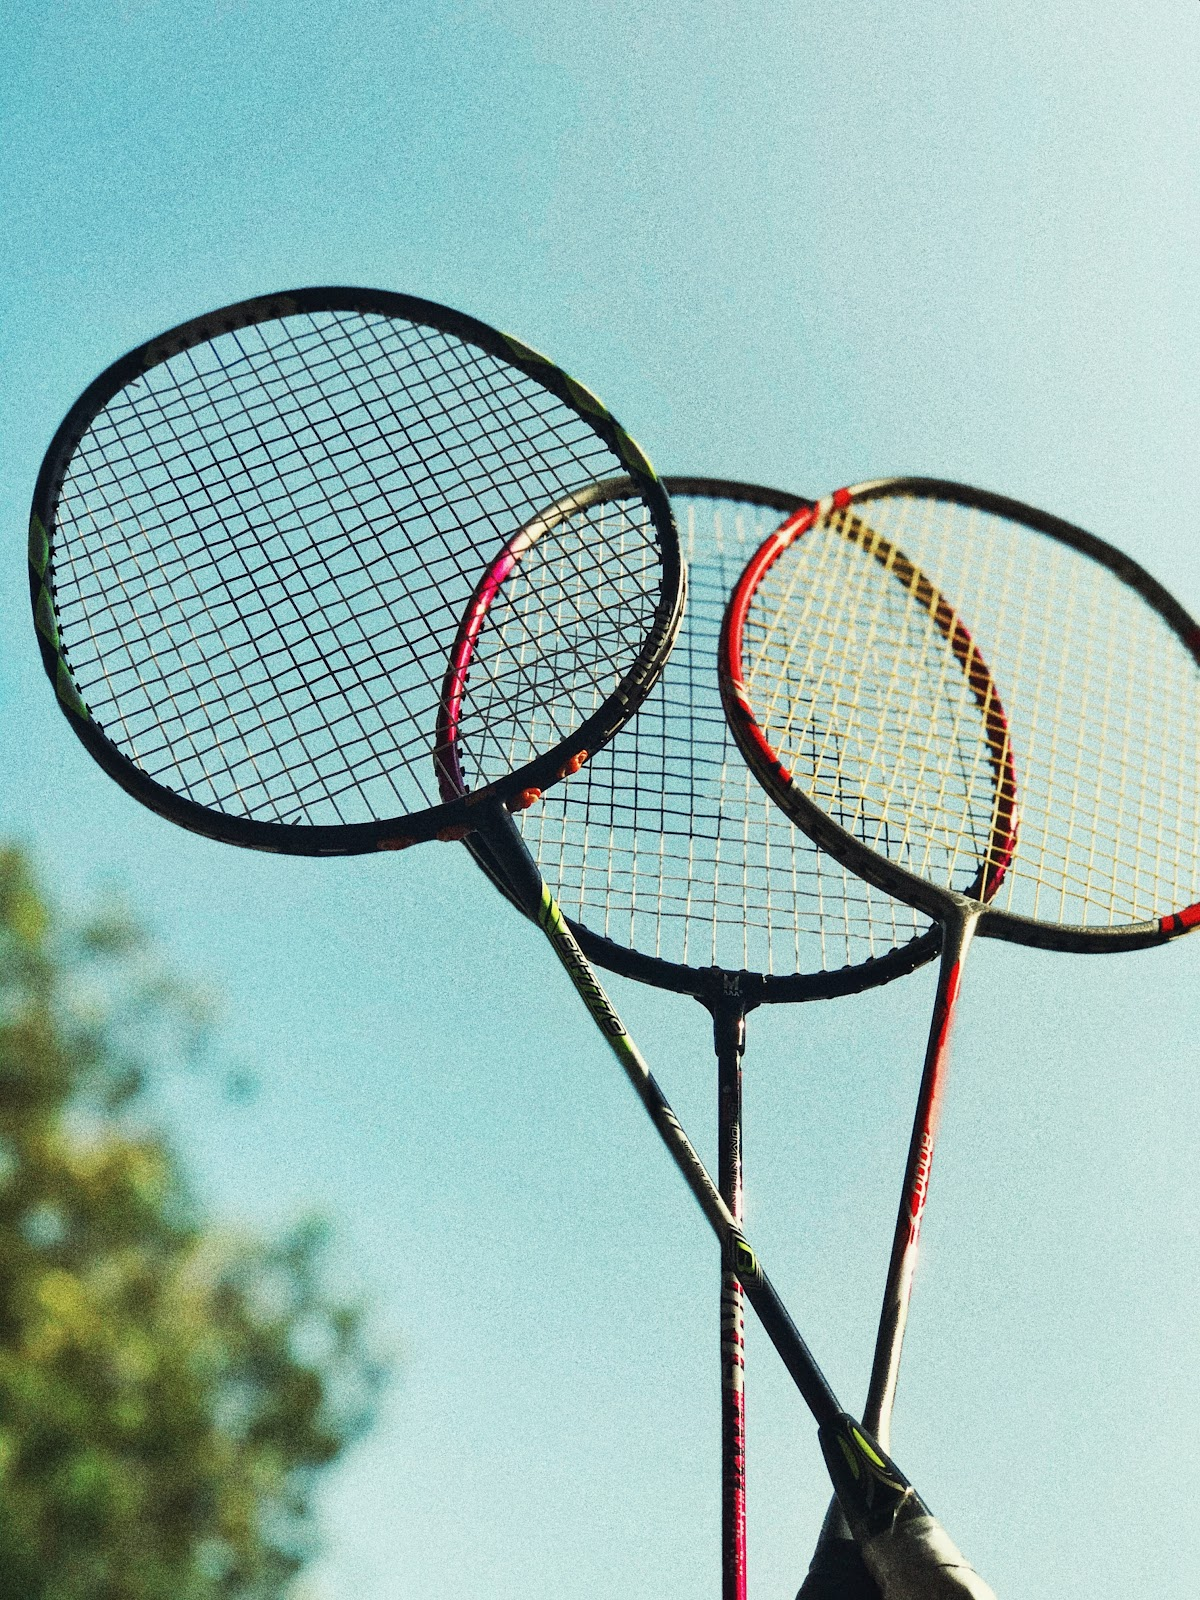 Three badminton rackets raised high against a blue sky.